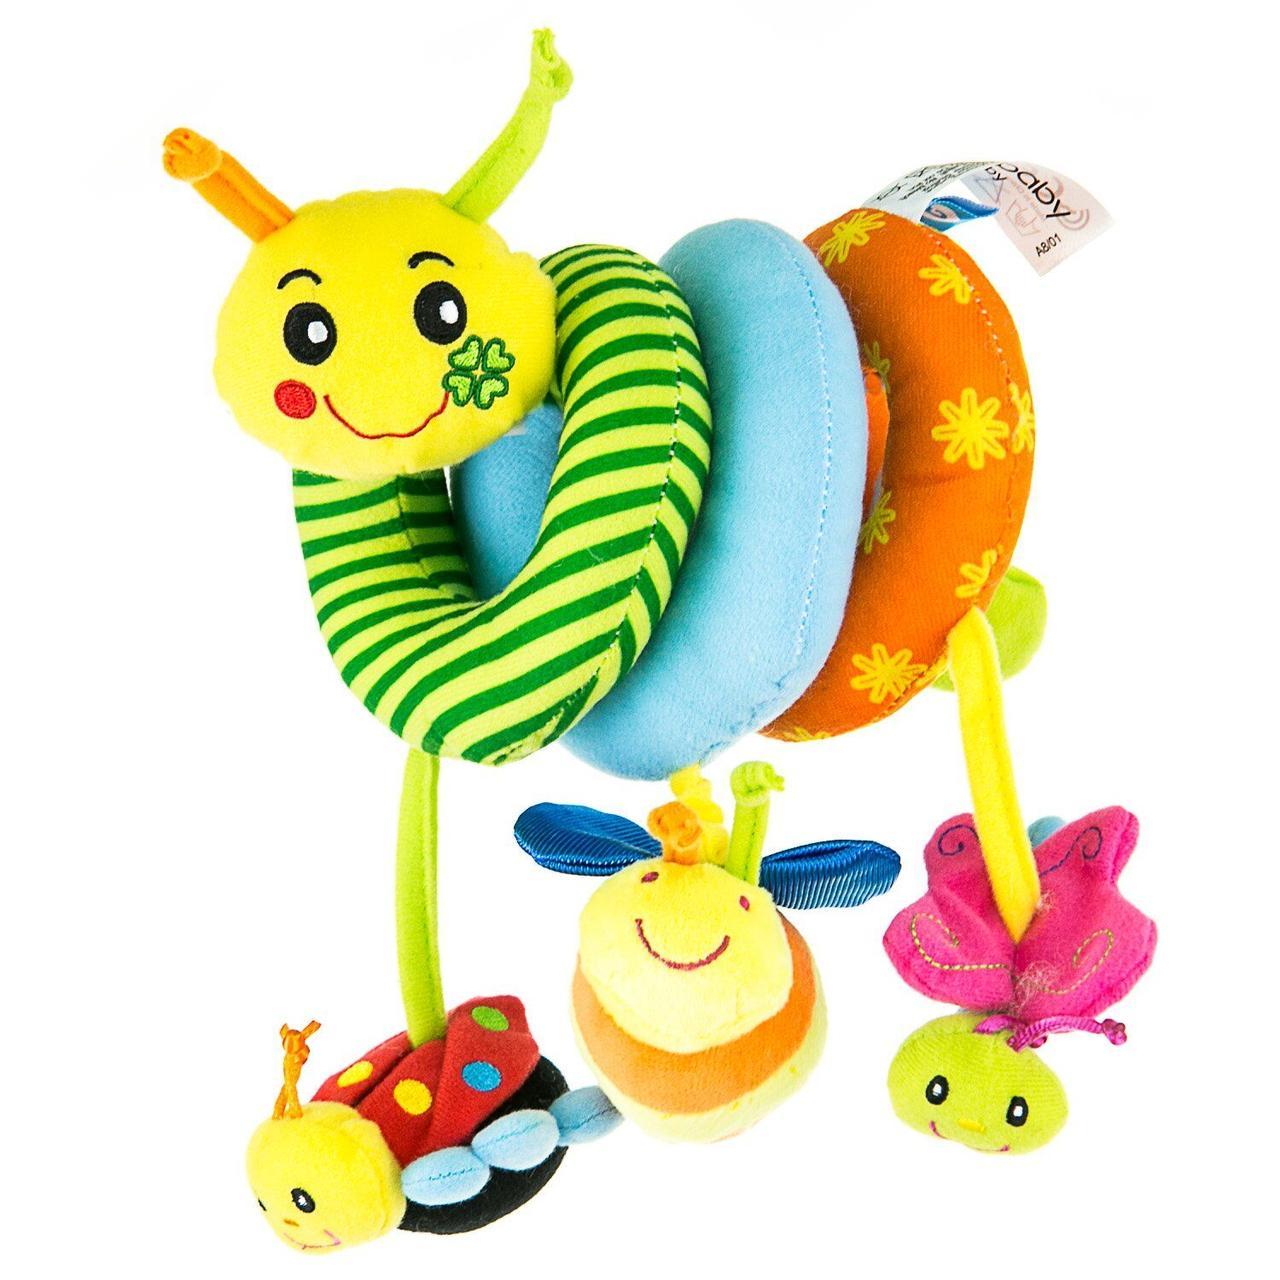 Развивающая игрушка-спираль Счастливая Улитка ТМ  Mioobaby